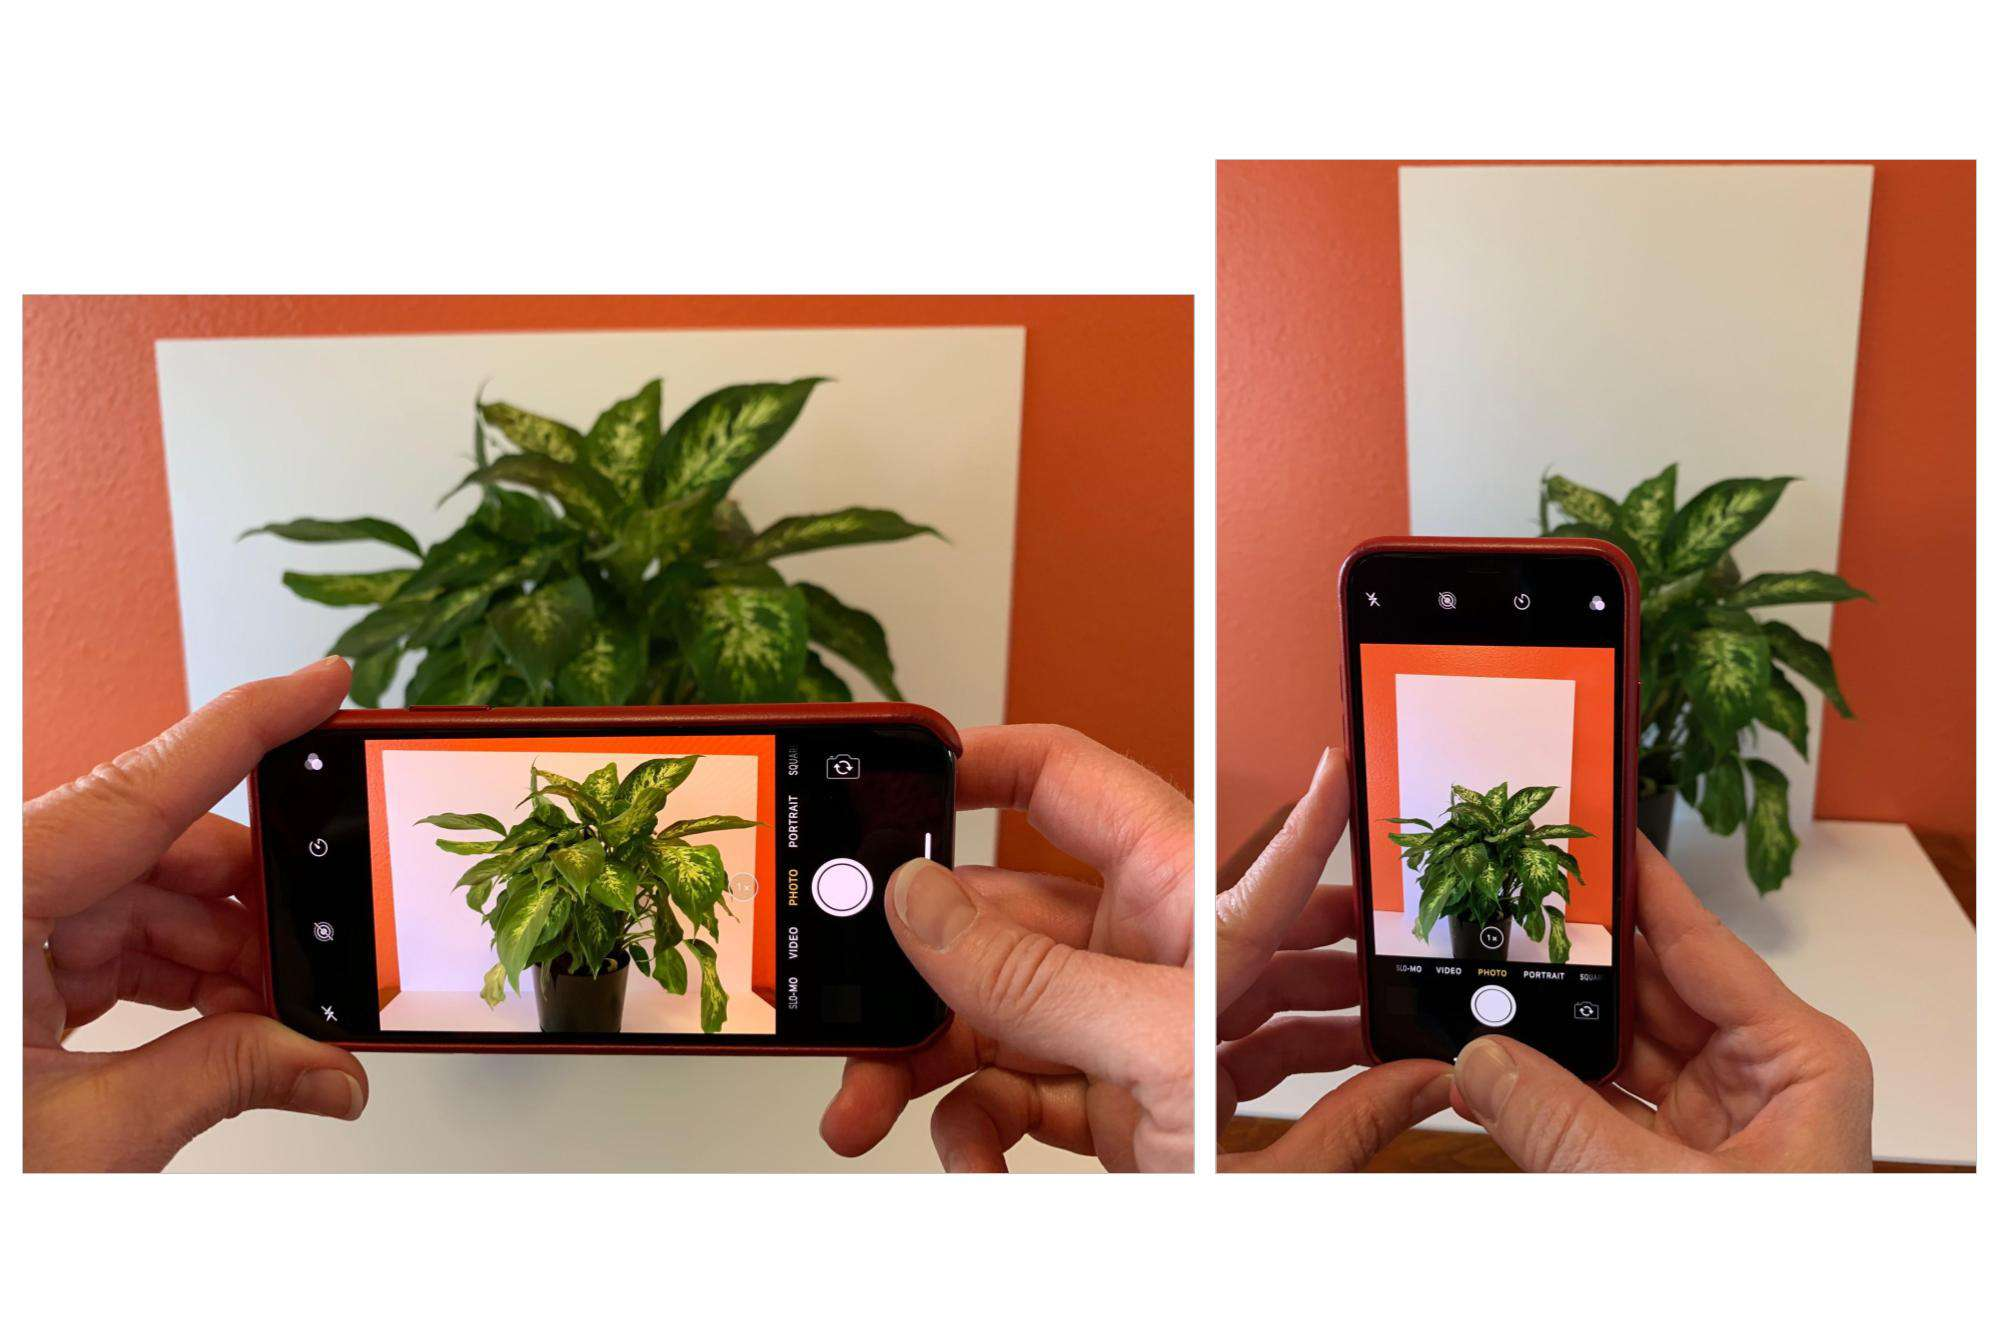 Left image shows iPhone held in landscape orientation; right image shows iPhone held in portrait orientation